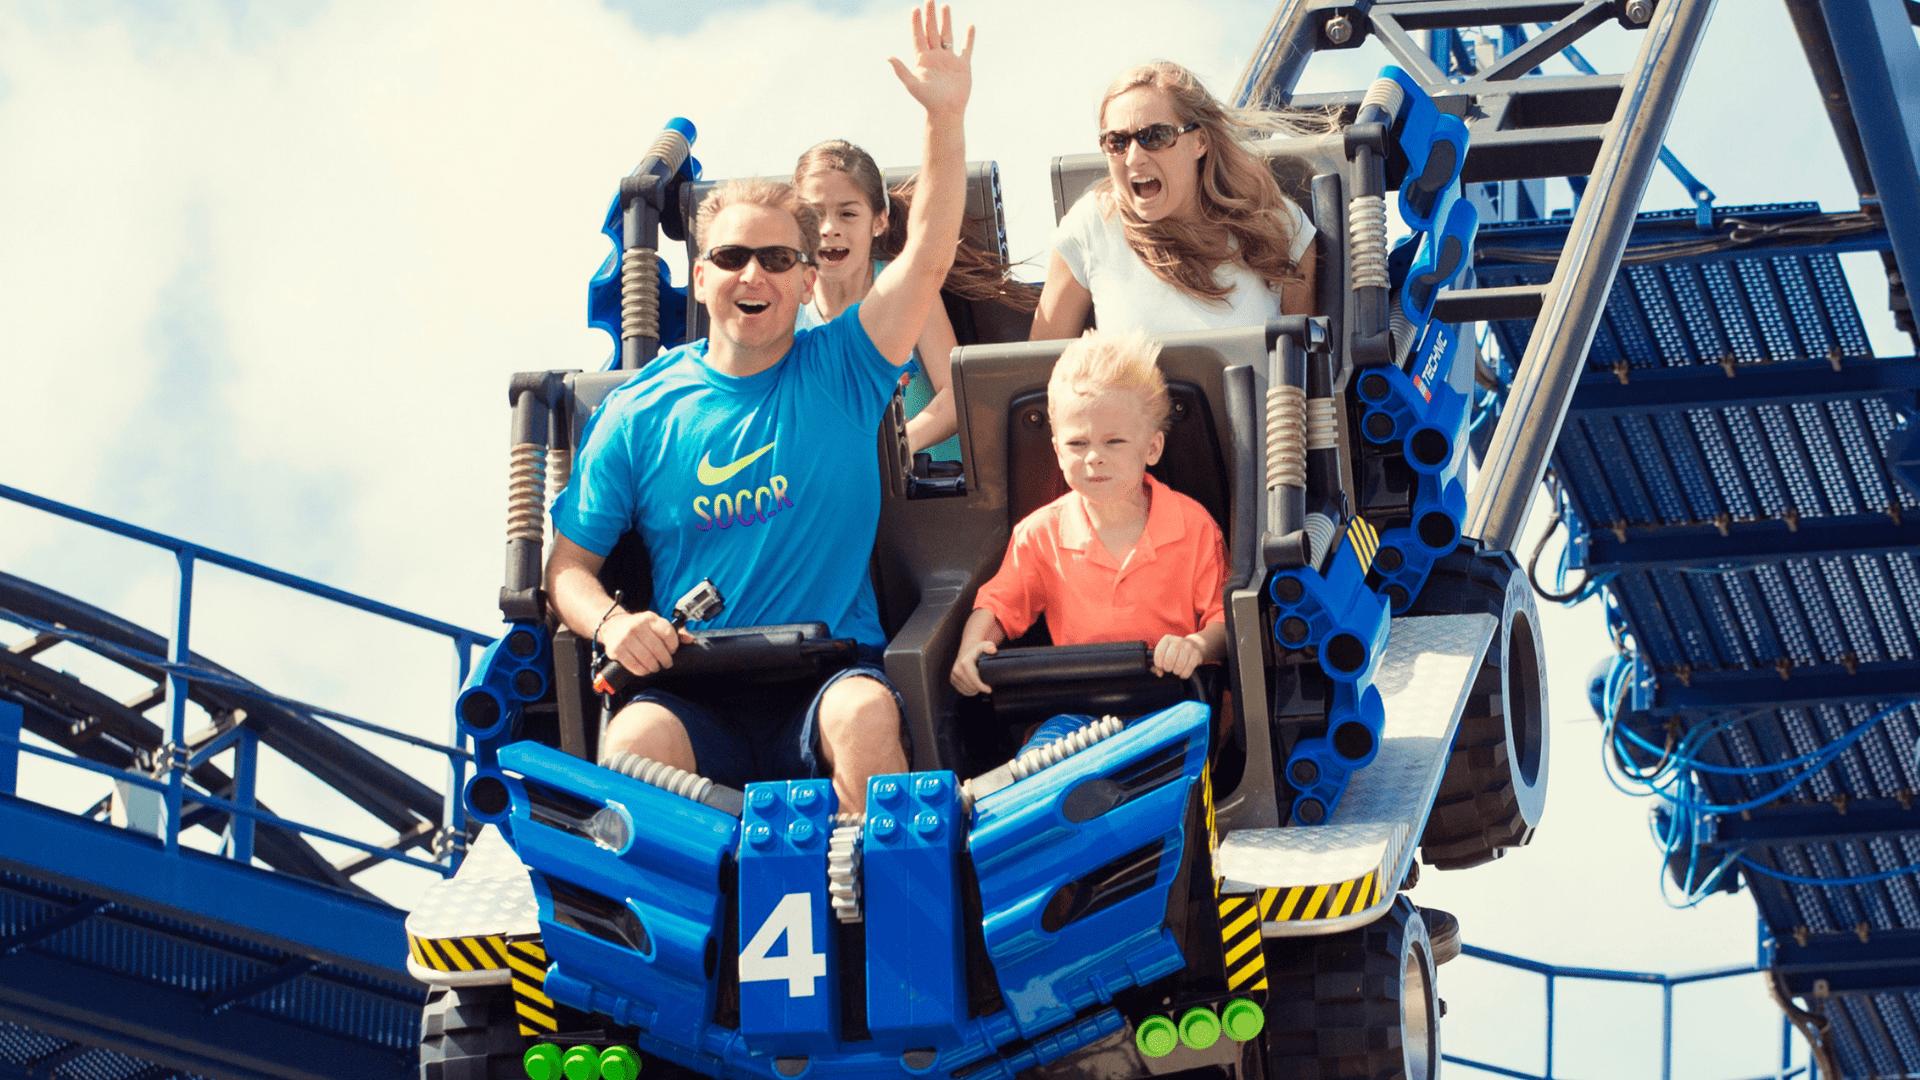 Šeima linksminasi Legolendo parke